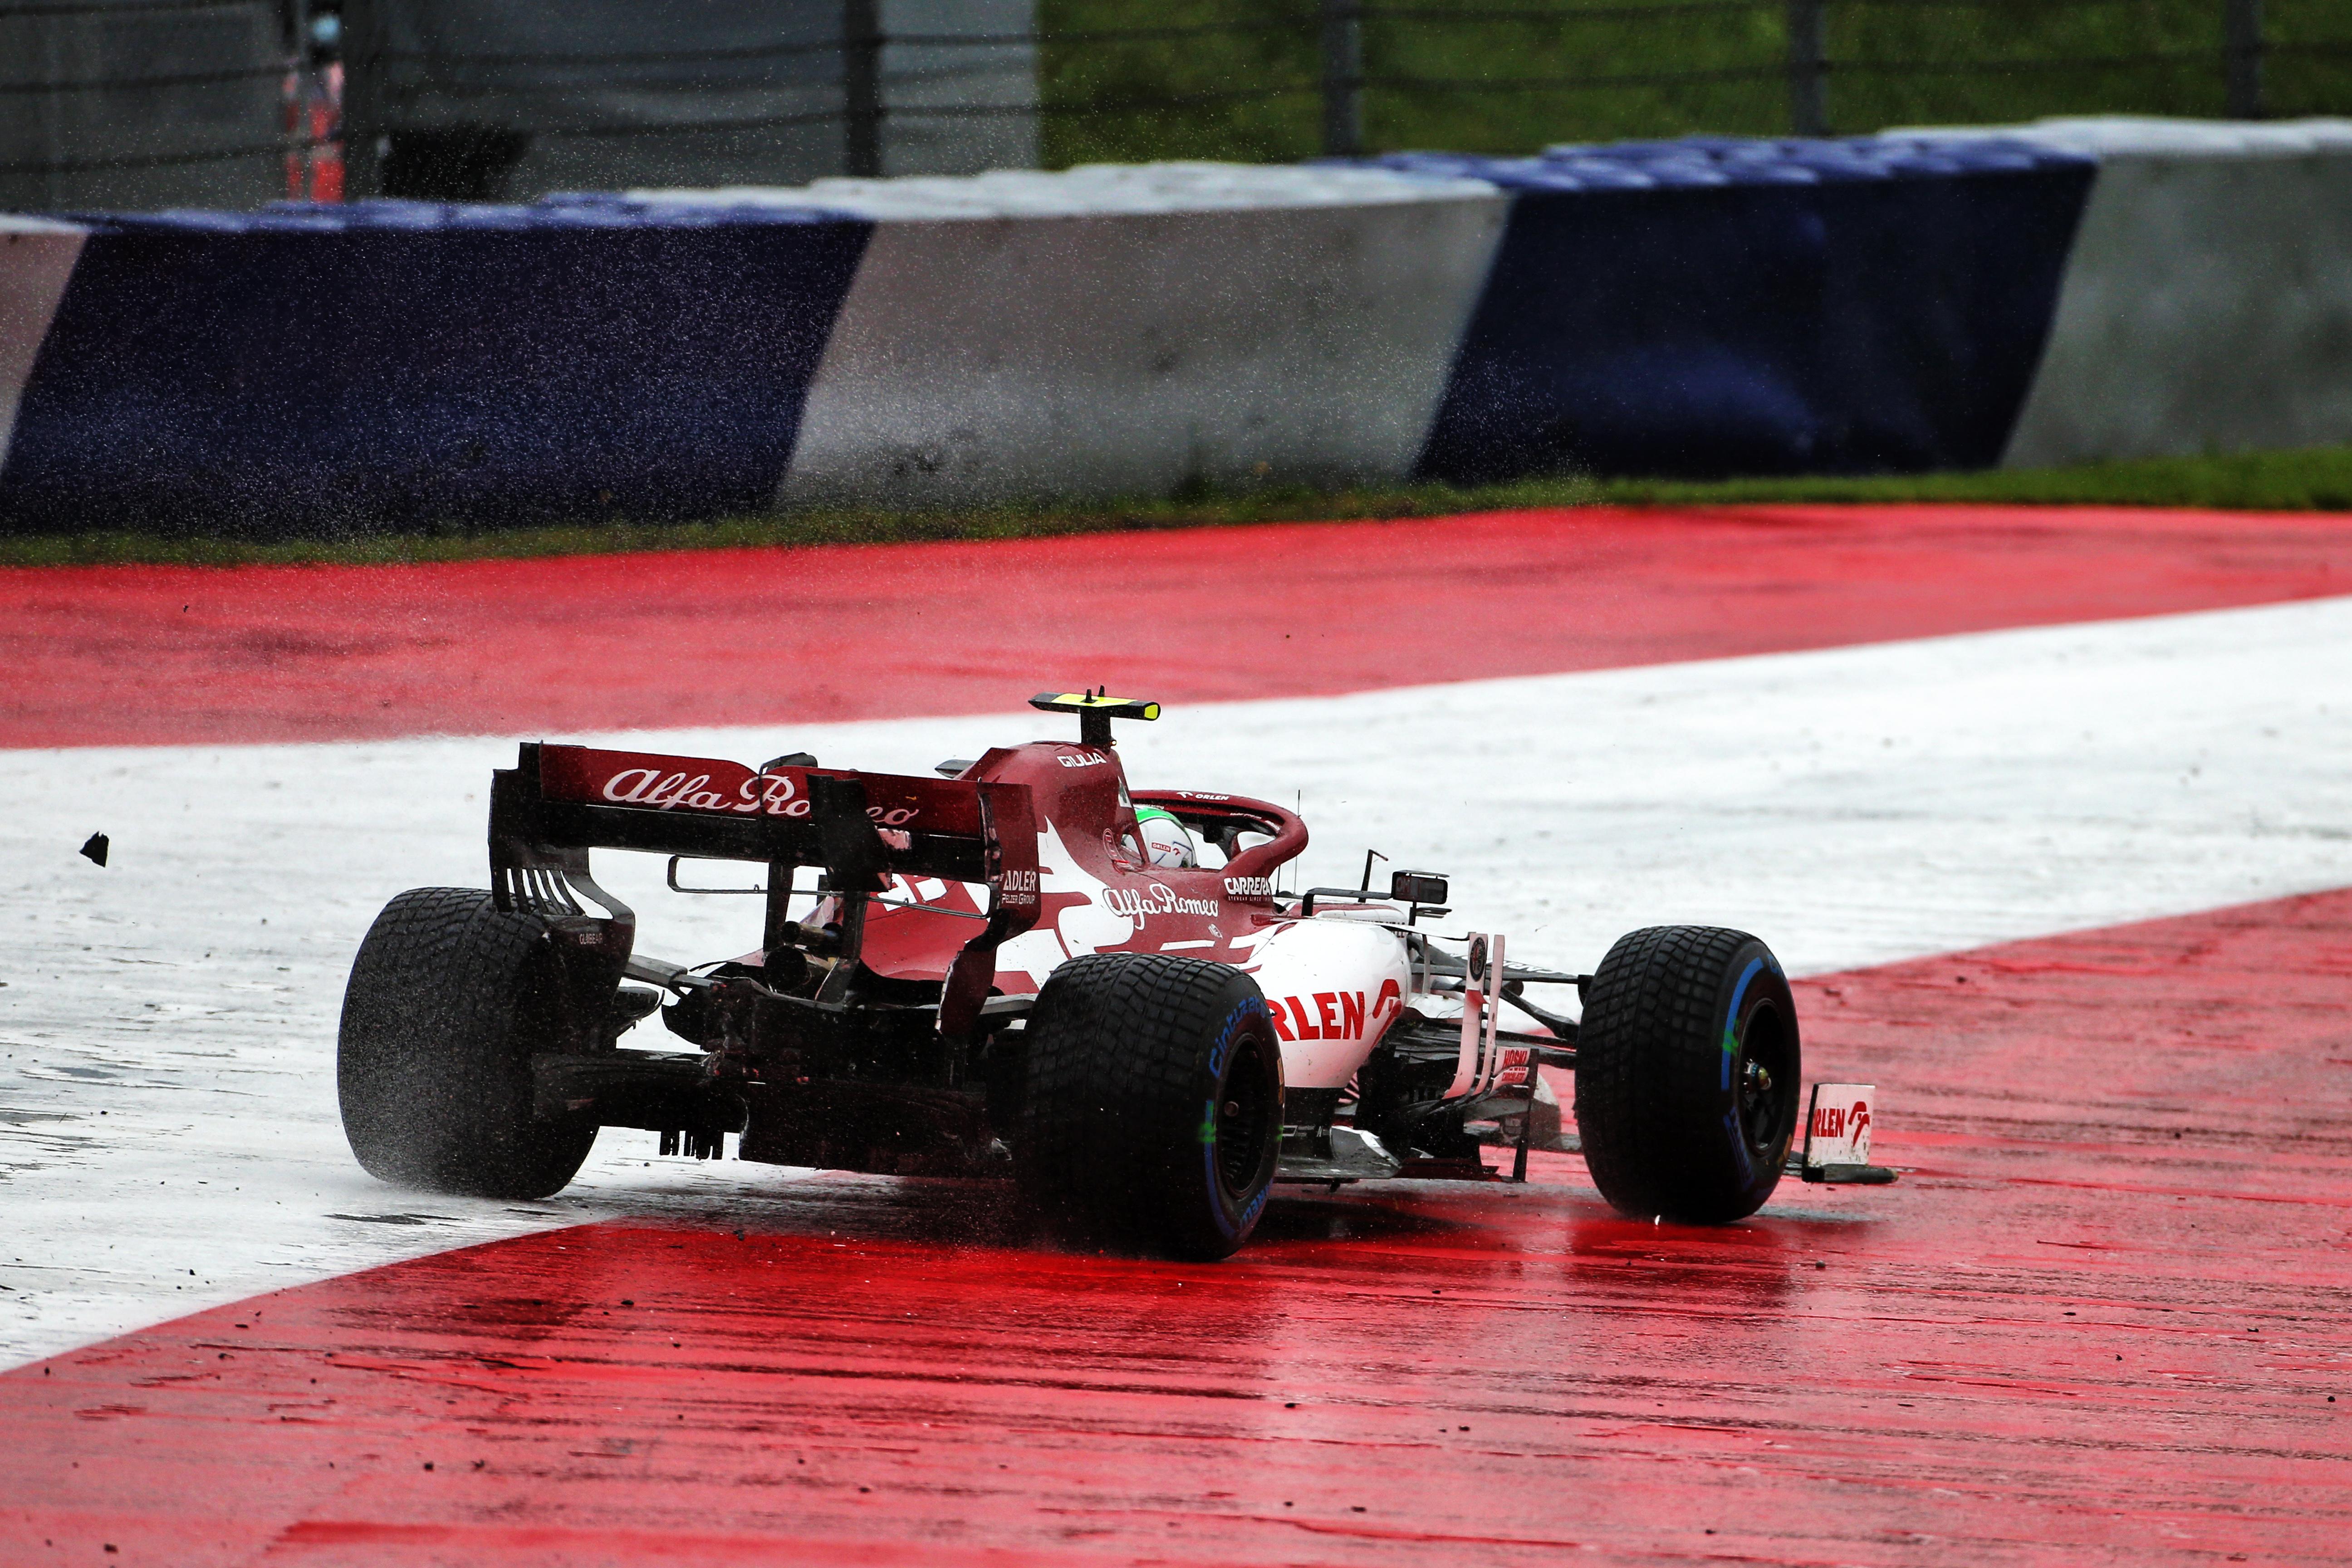 Antonio Giovinazzi Alfa Romeo spin Styrian Grand Prix qualifying 2020